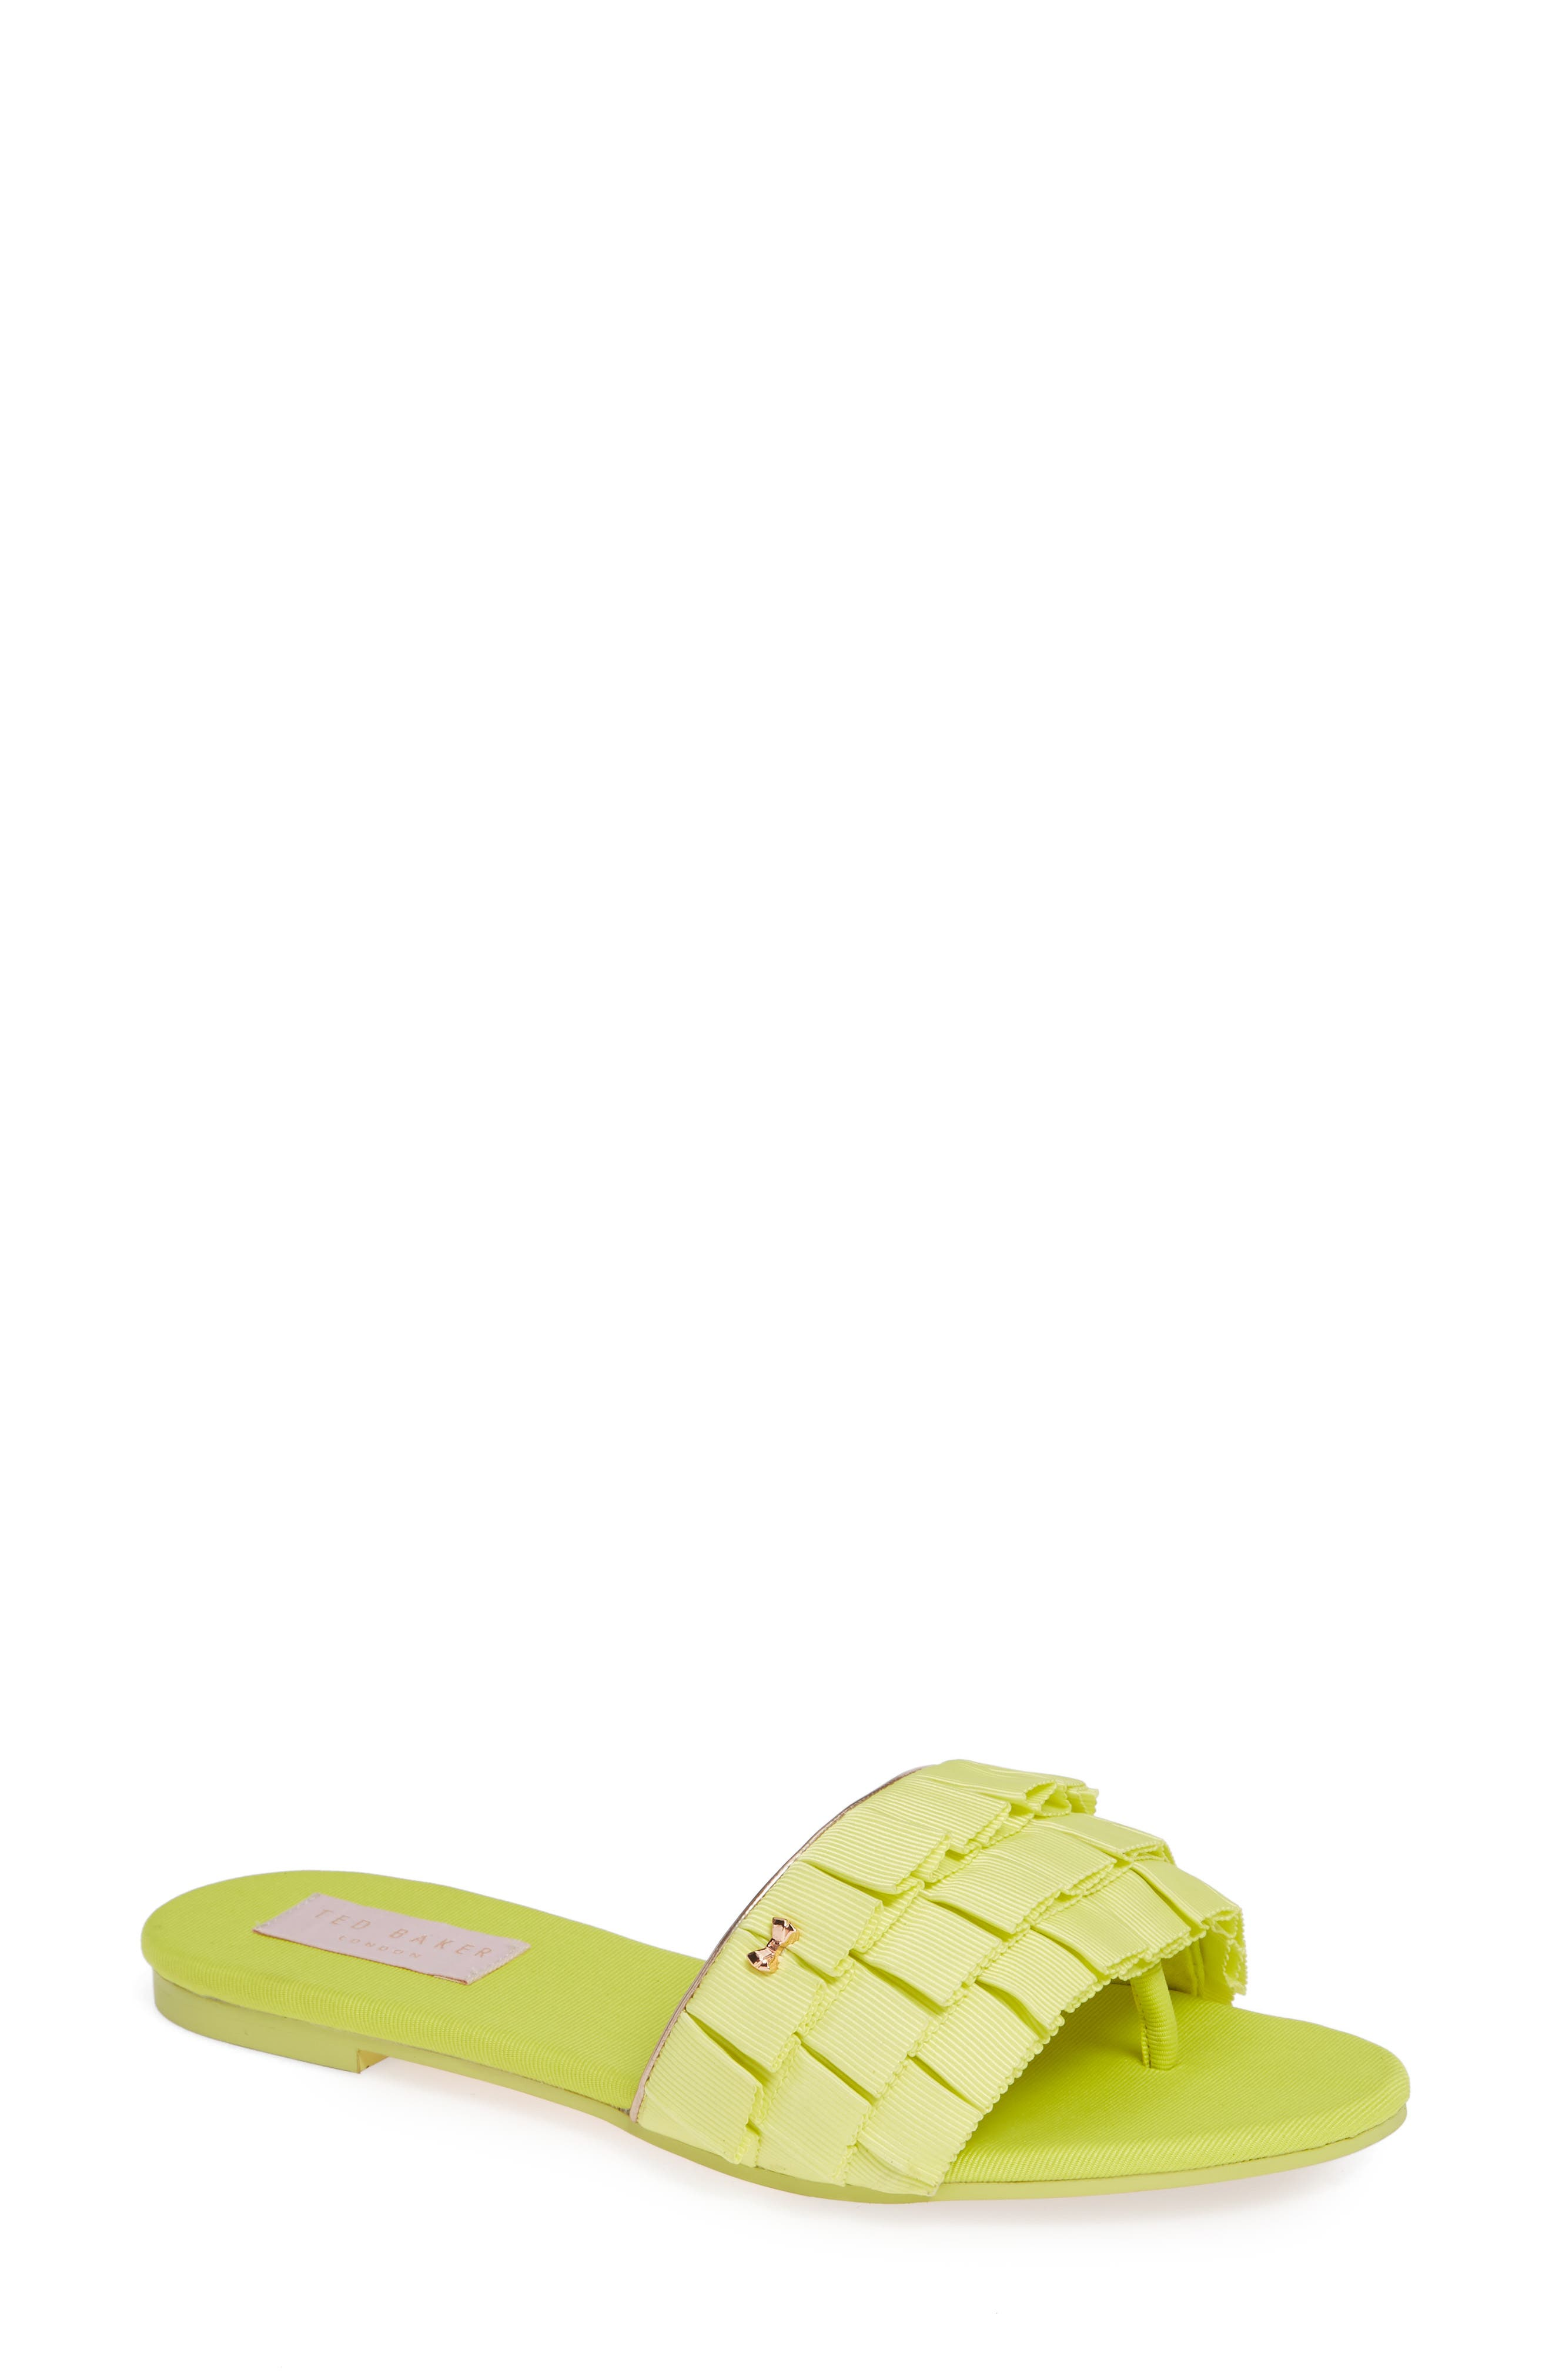 Towdi Sandal,                         Main,                         color, Yellow Fabric